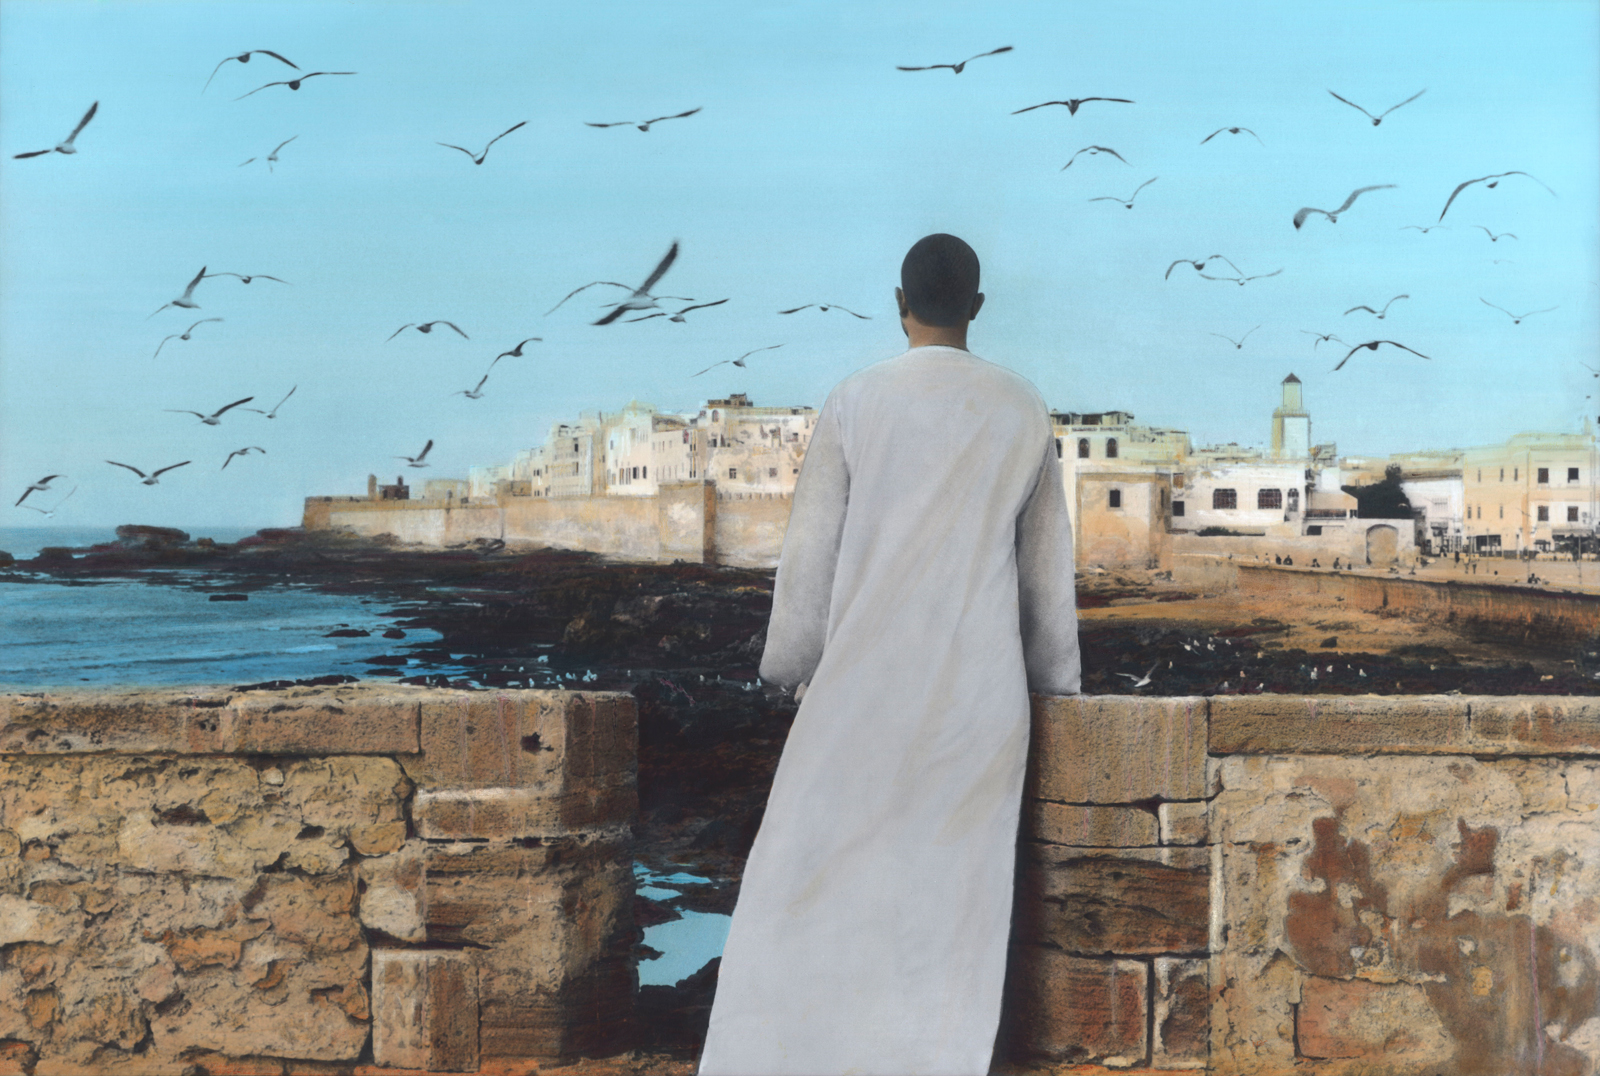 Self-portrait, Essaouira 2011.jpg